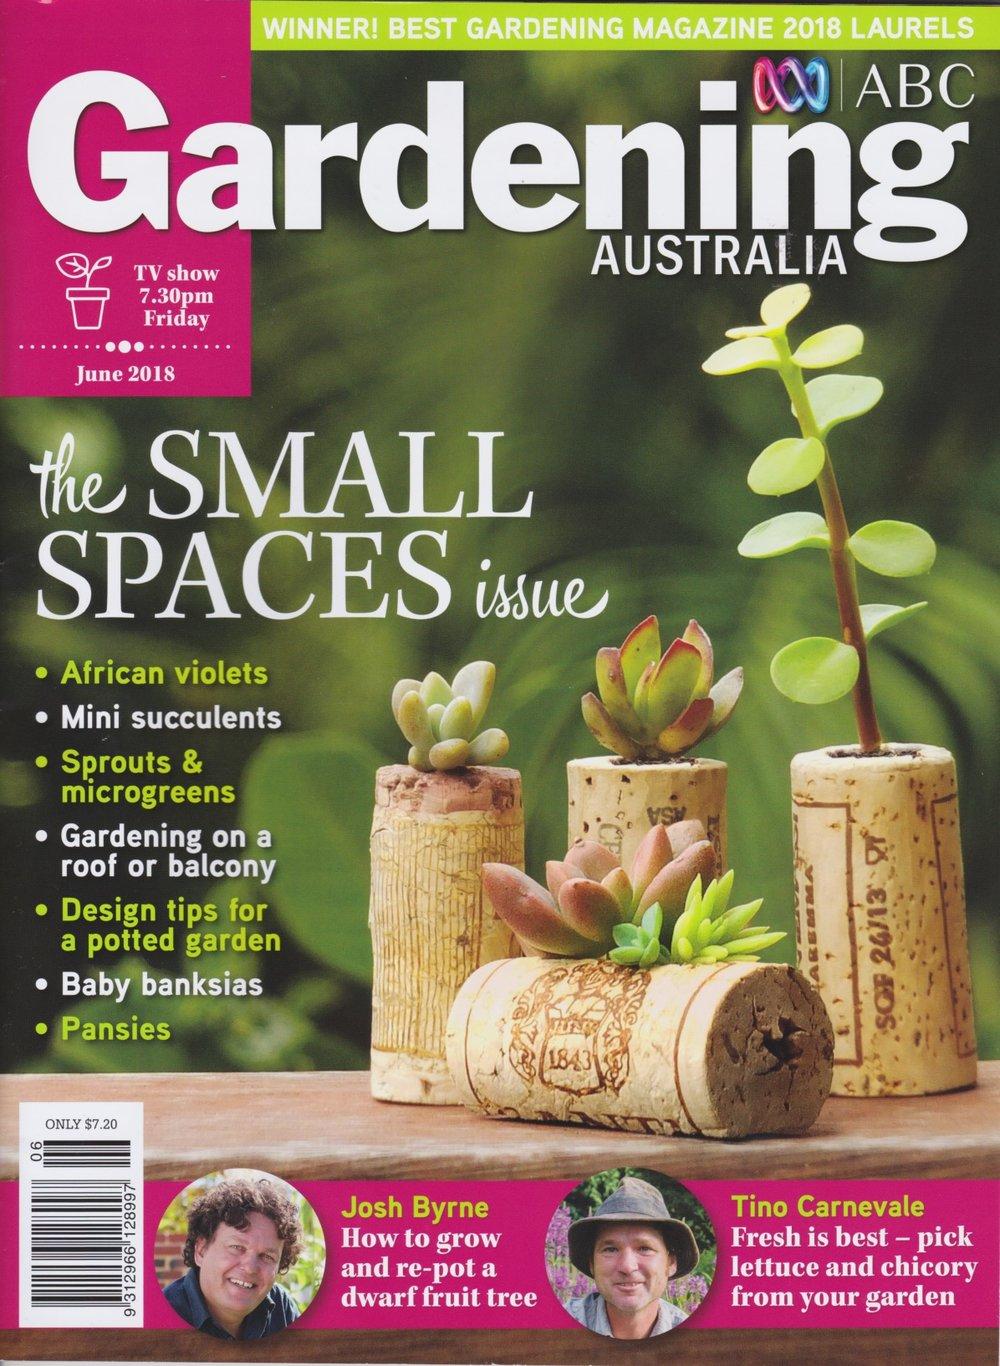 Gardening Australia May 2018